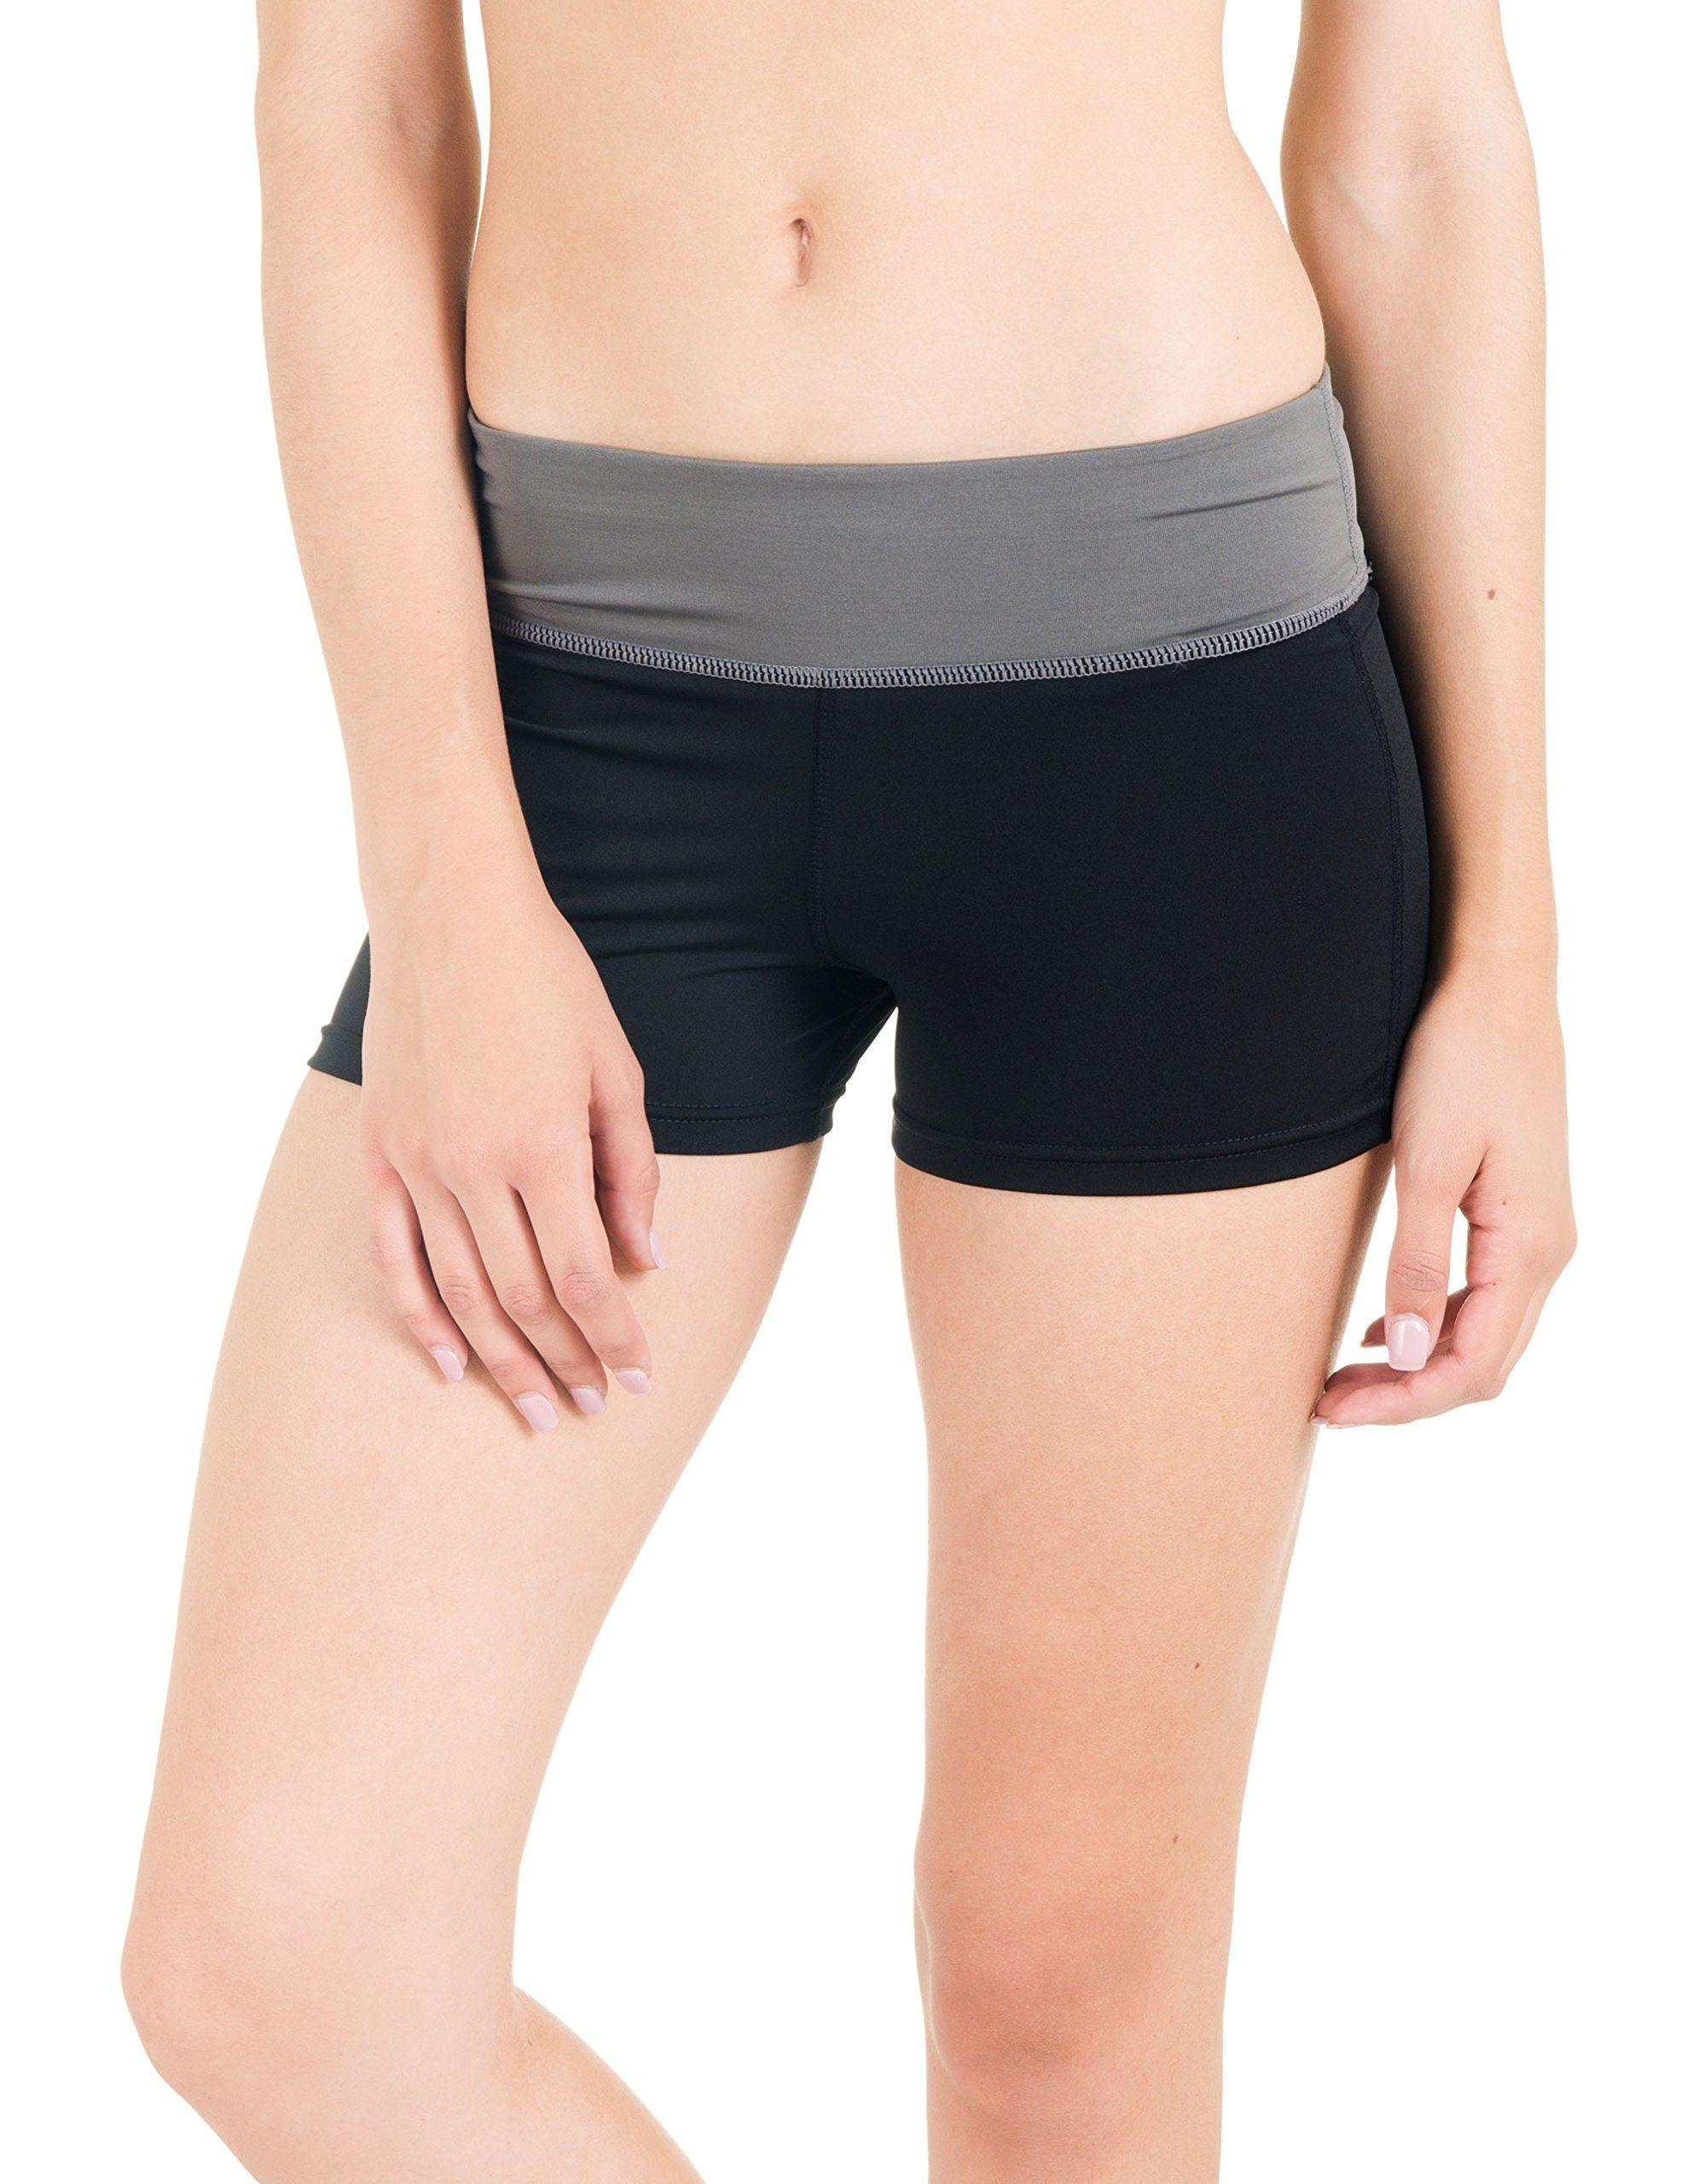 Flex Juniors Lightweight Yoga Shorts (Small/Medium, Black/Charcoal)